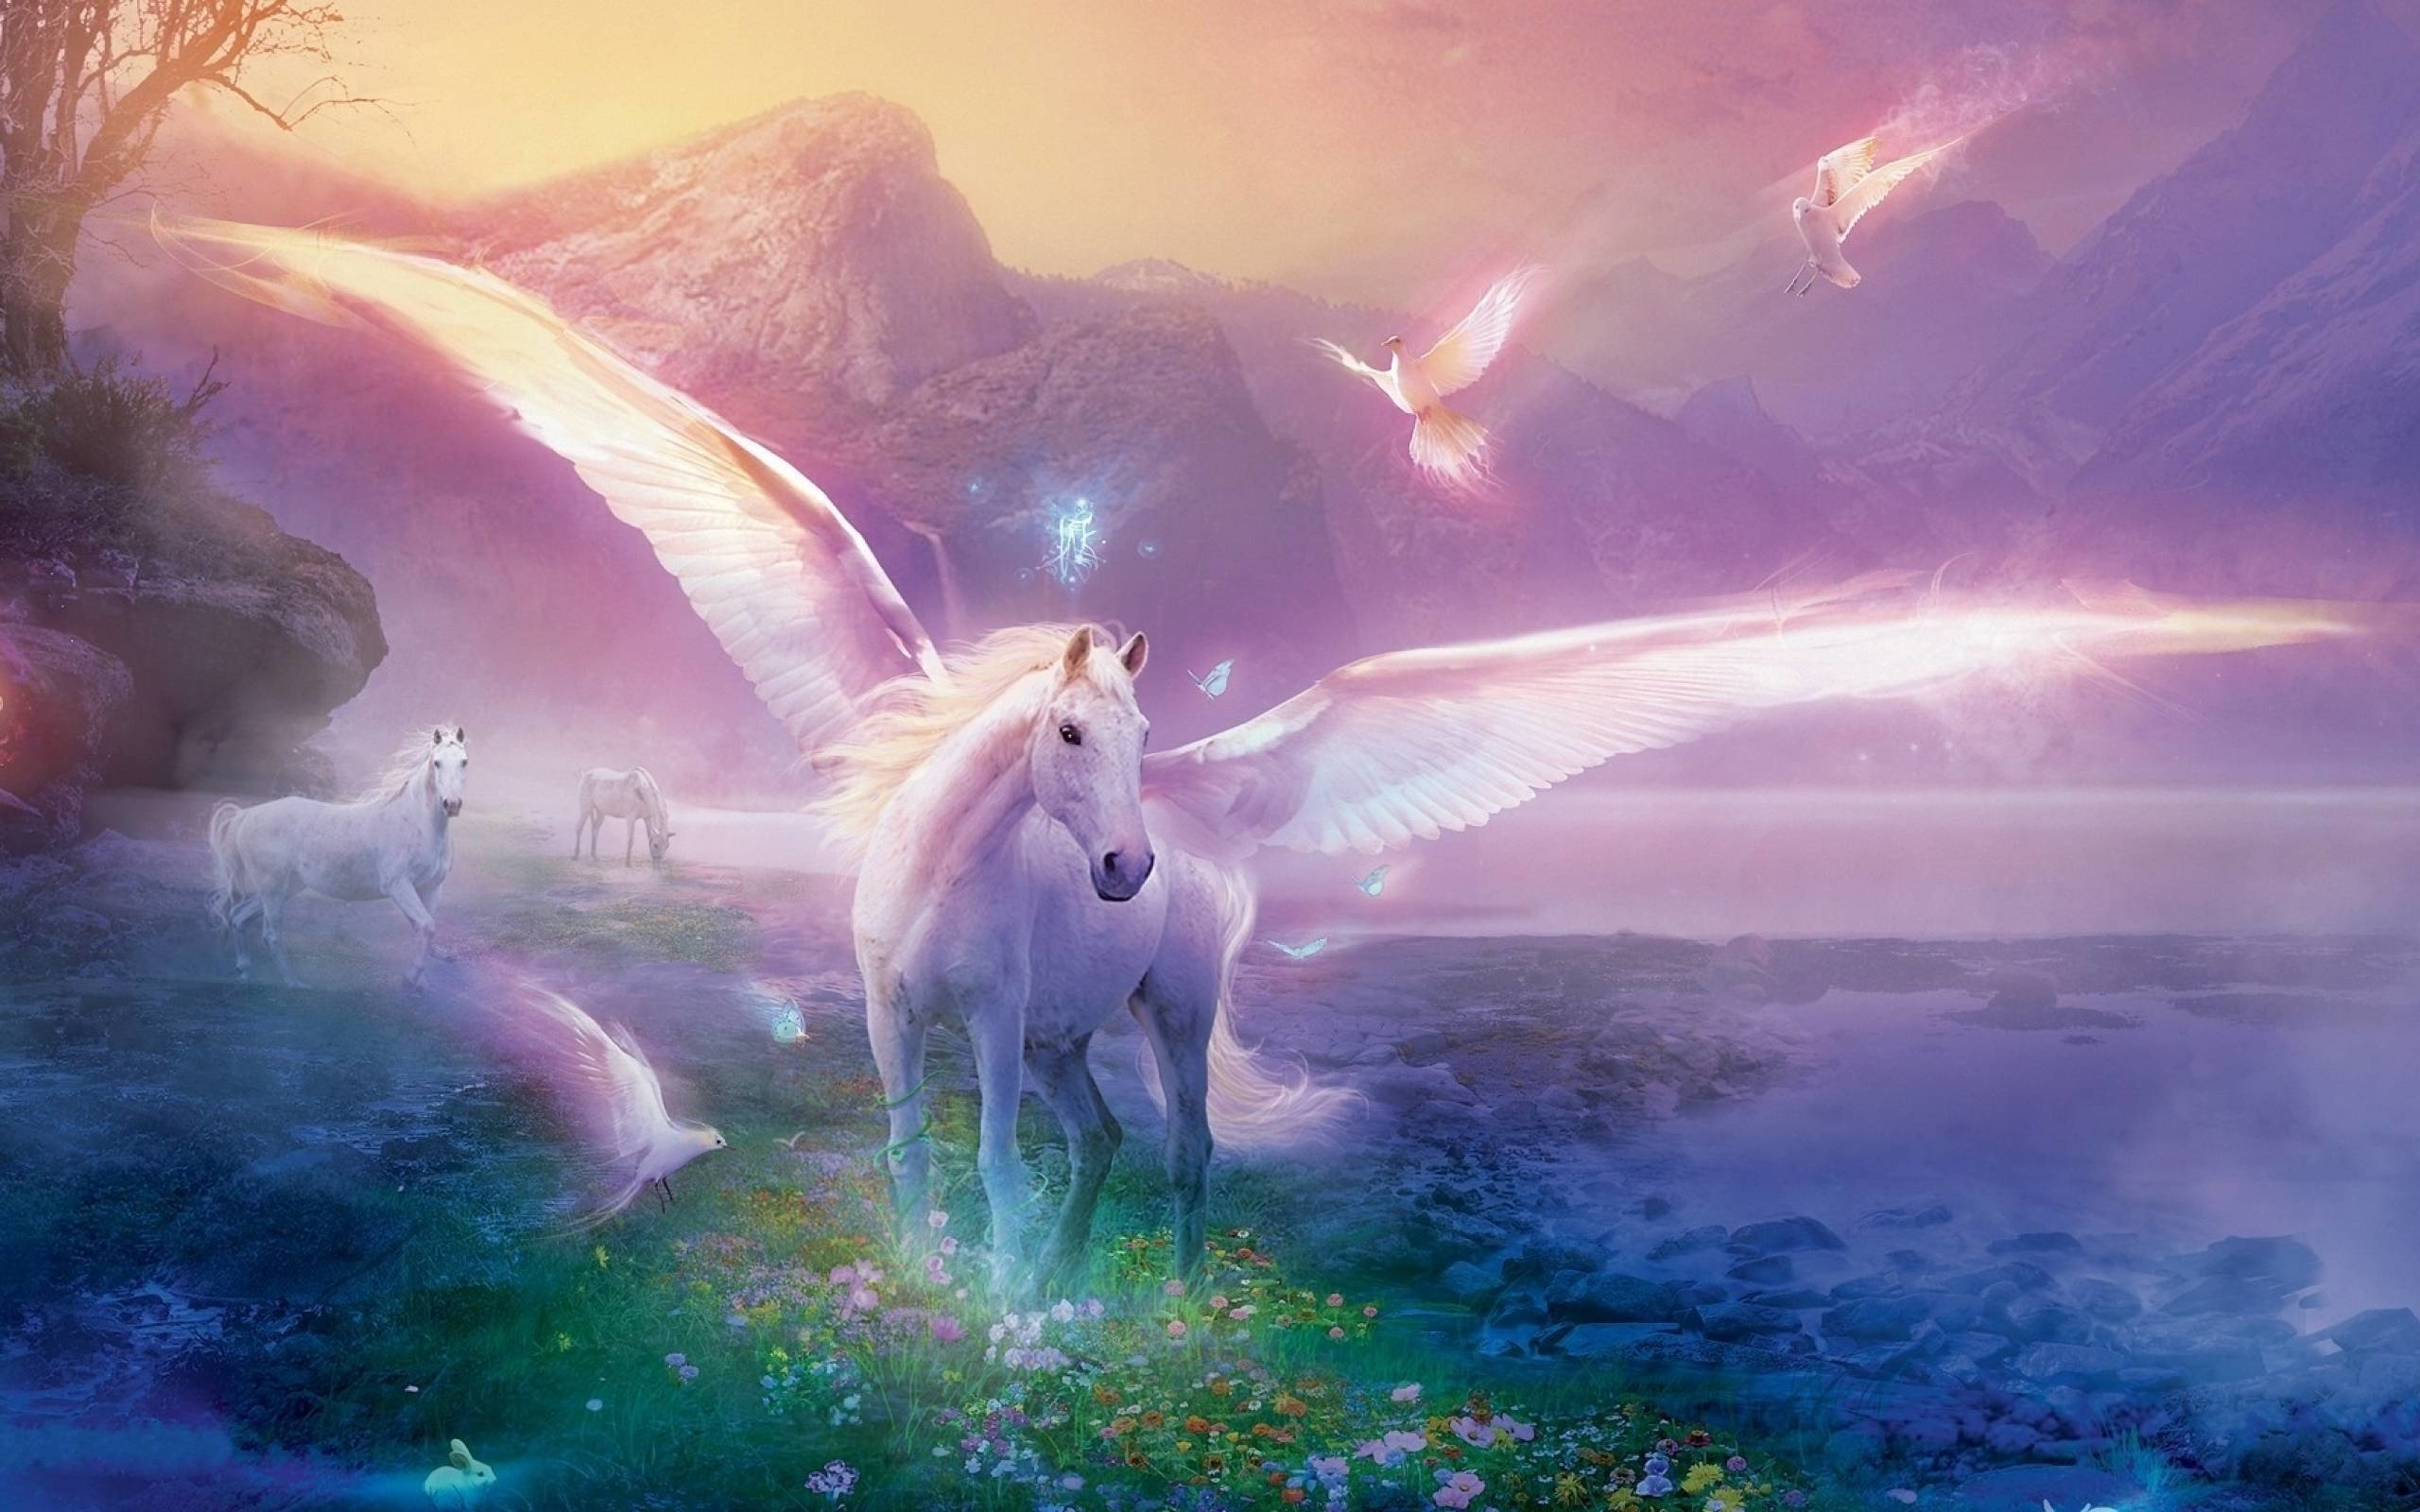 Unicorn Backgrounds for Desktop 69 images 2560x1600